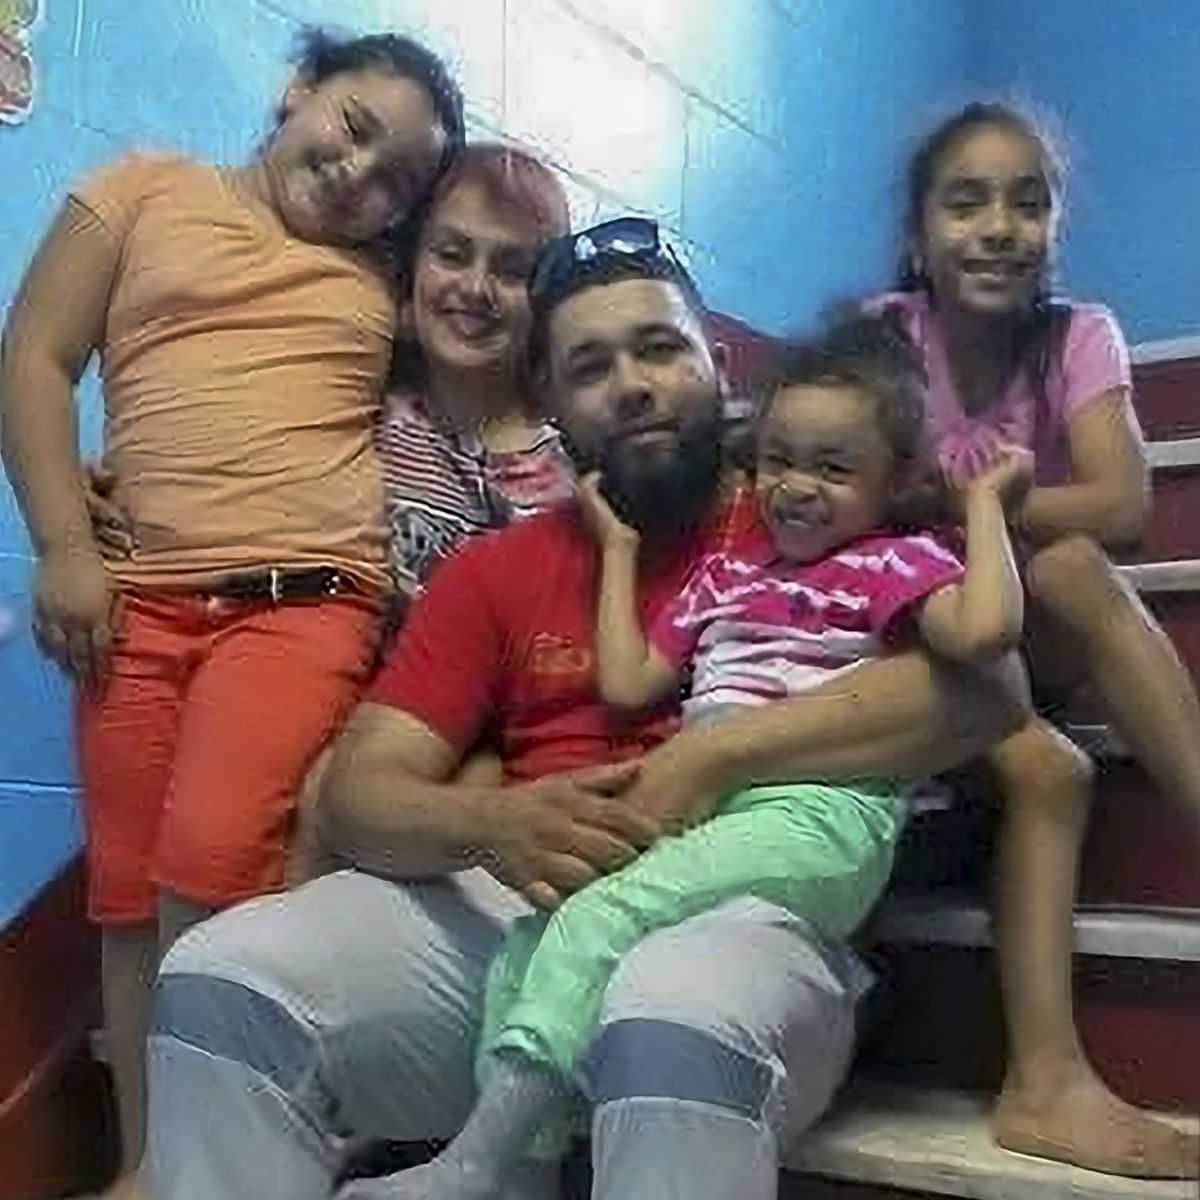 Joel Gomez Dominguez, Ileana Cotto and their daughters.